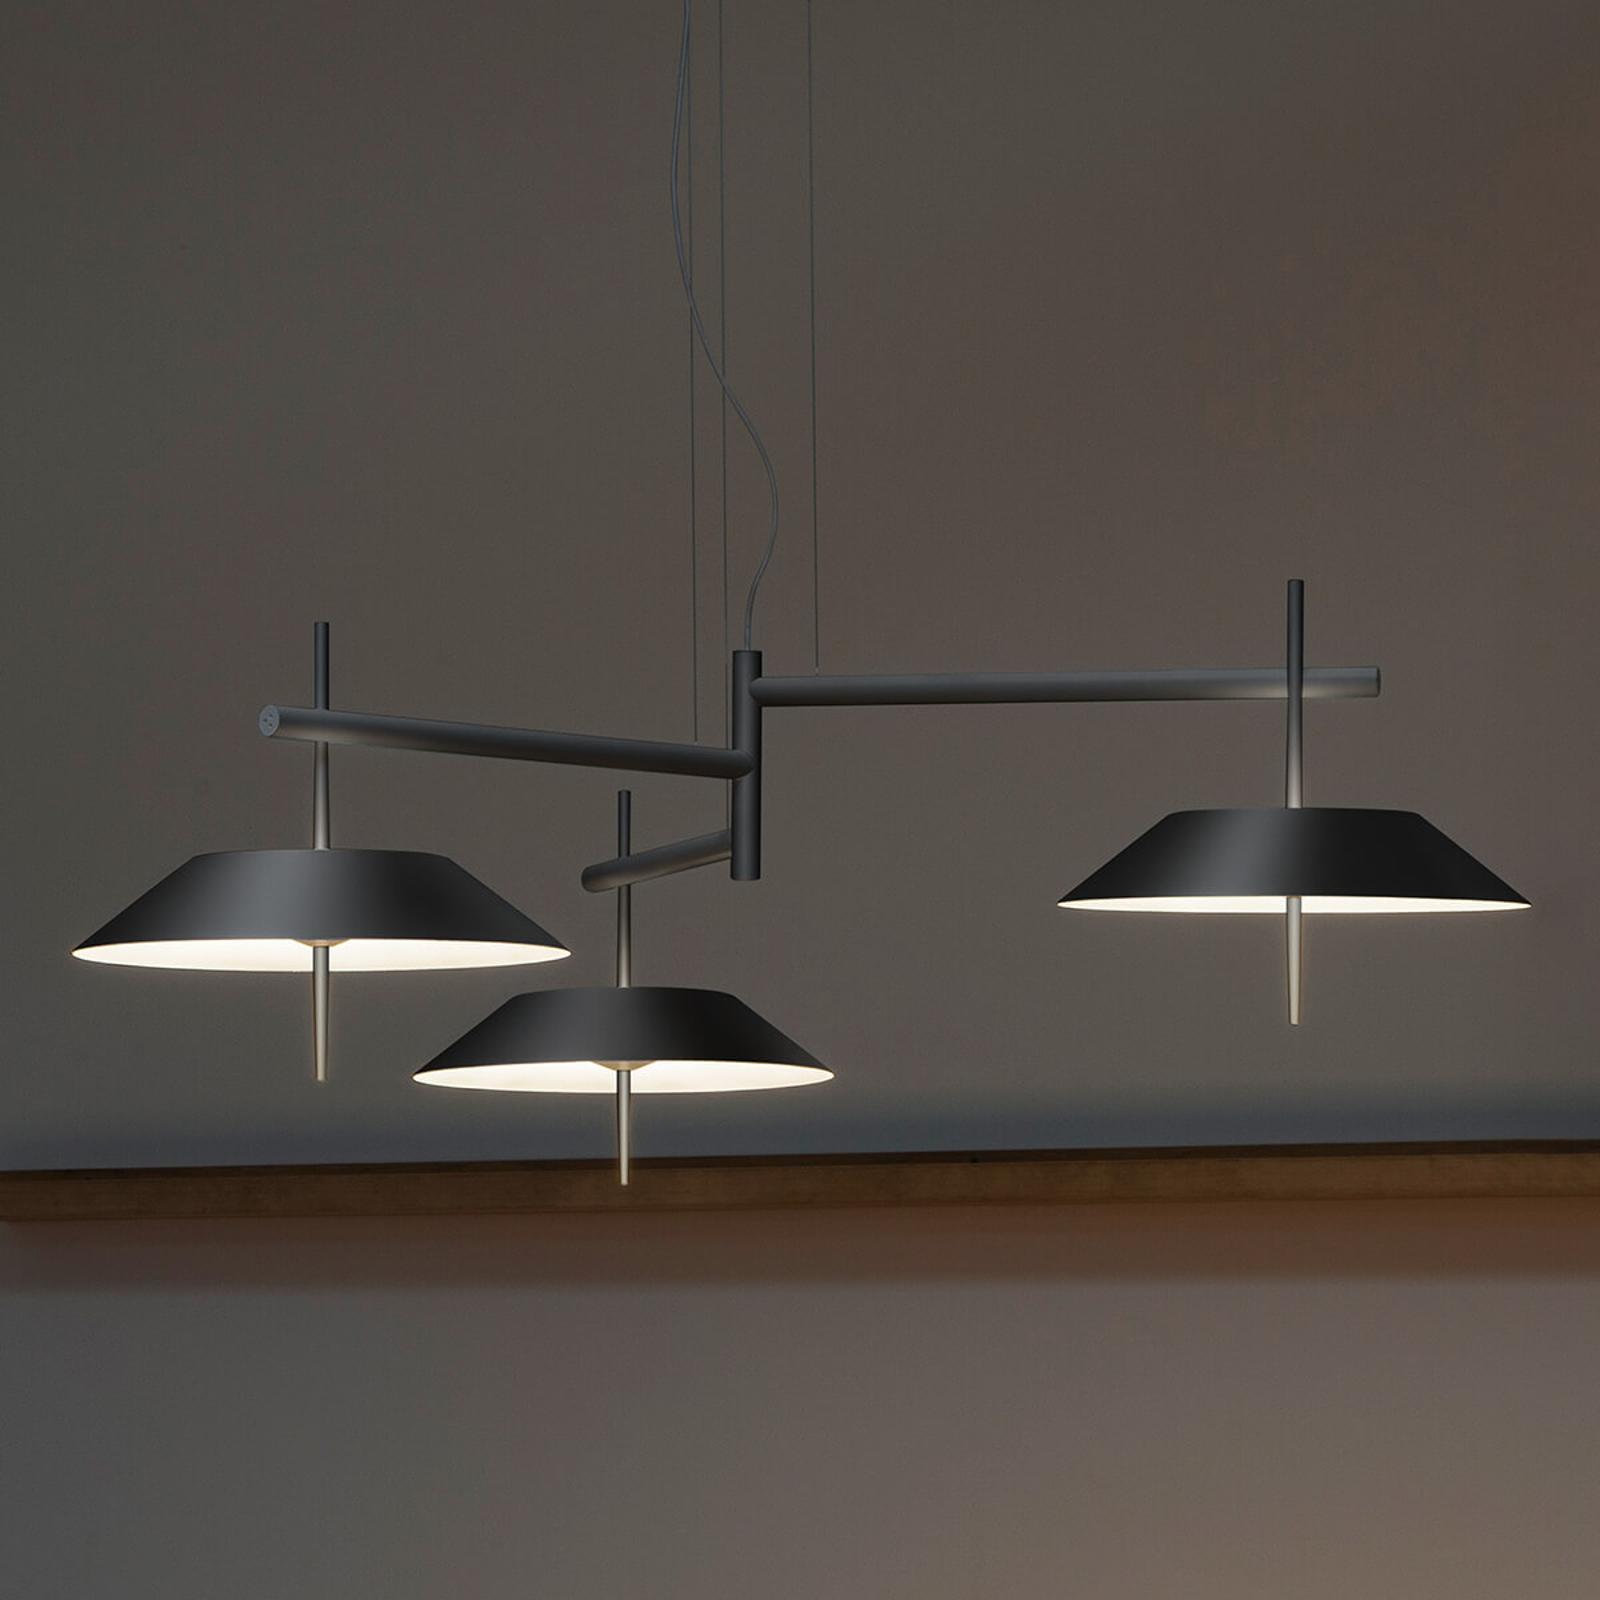 Suspension LED Mayfair 3 lampes, gris graphite